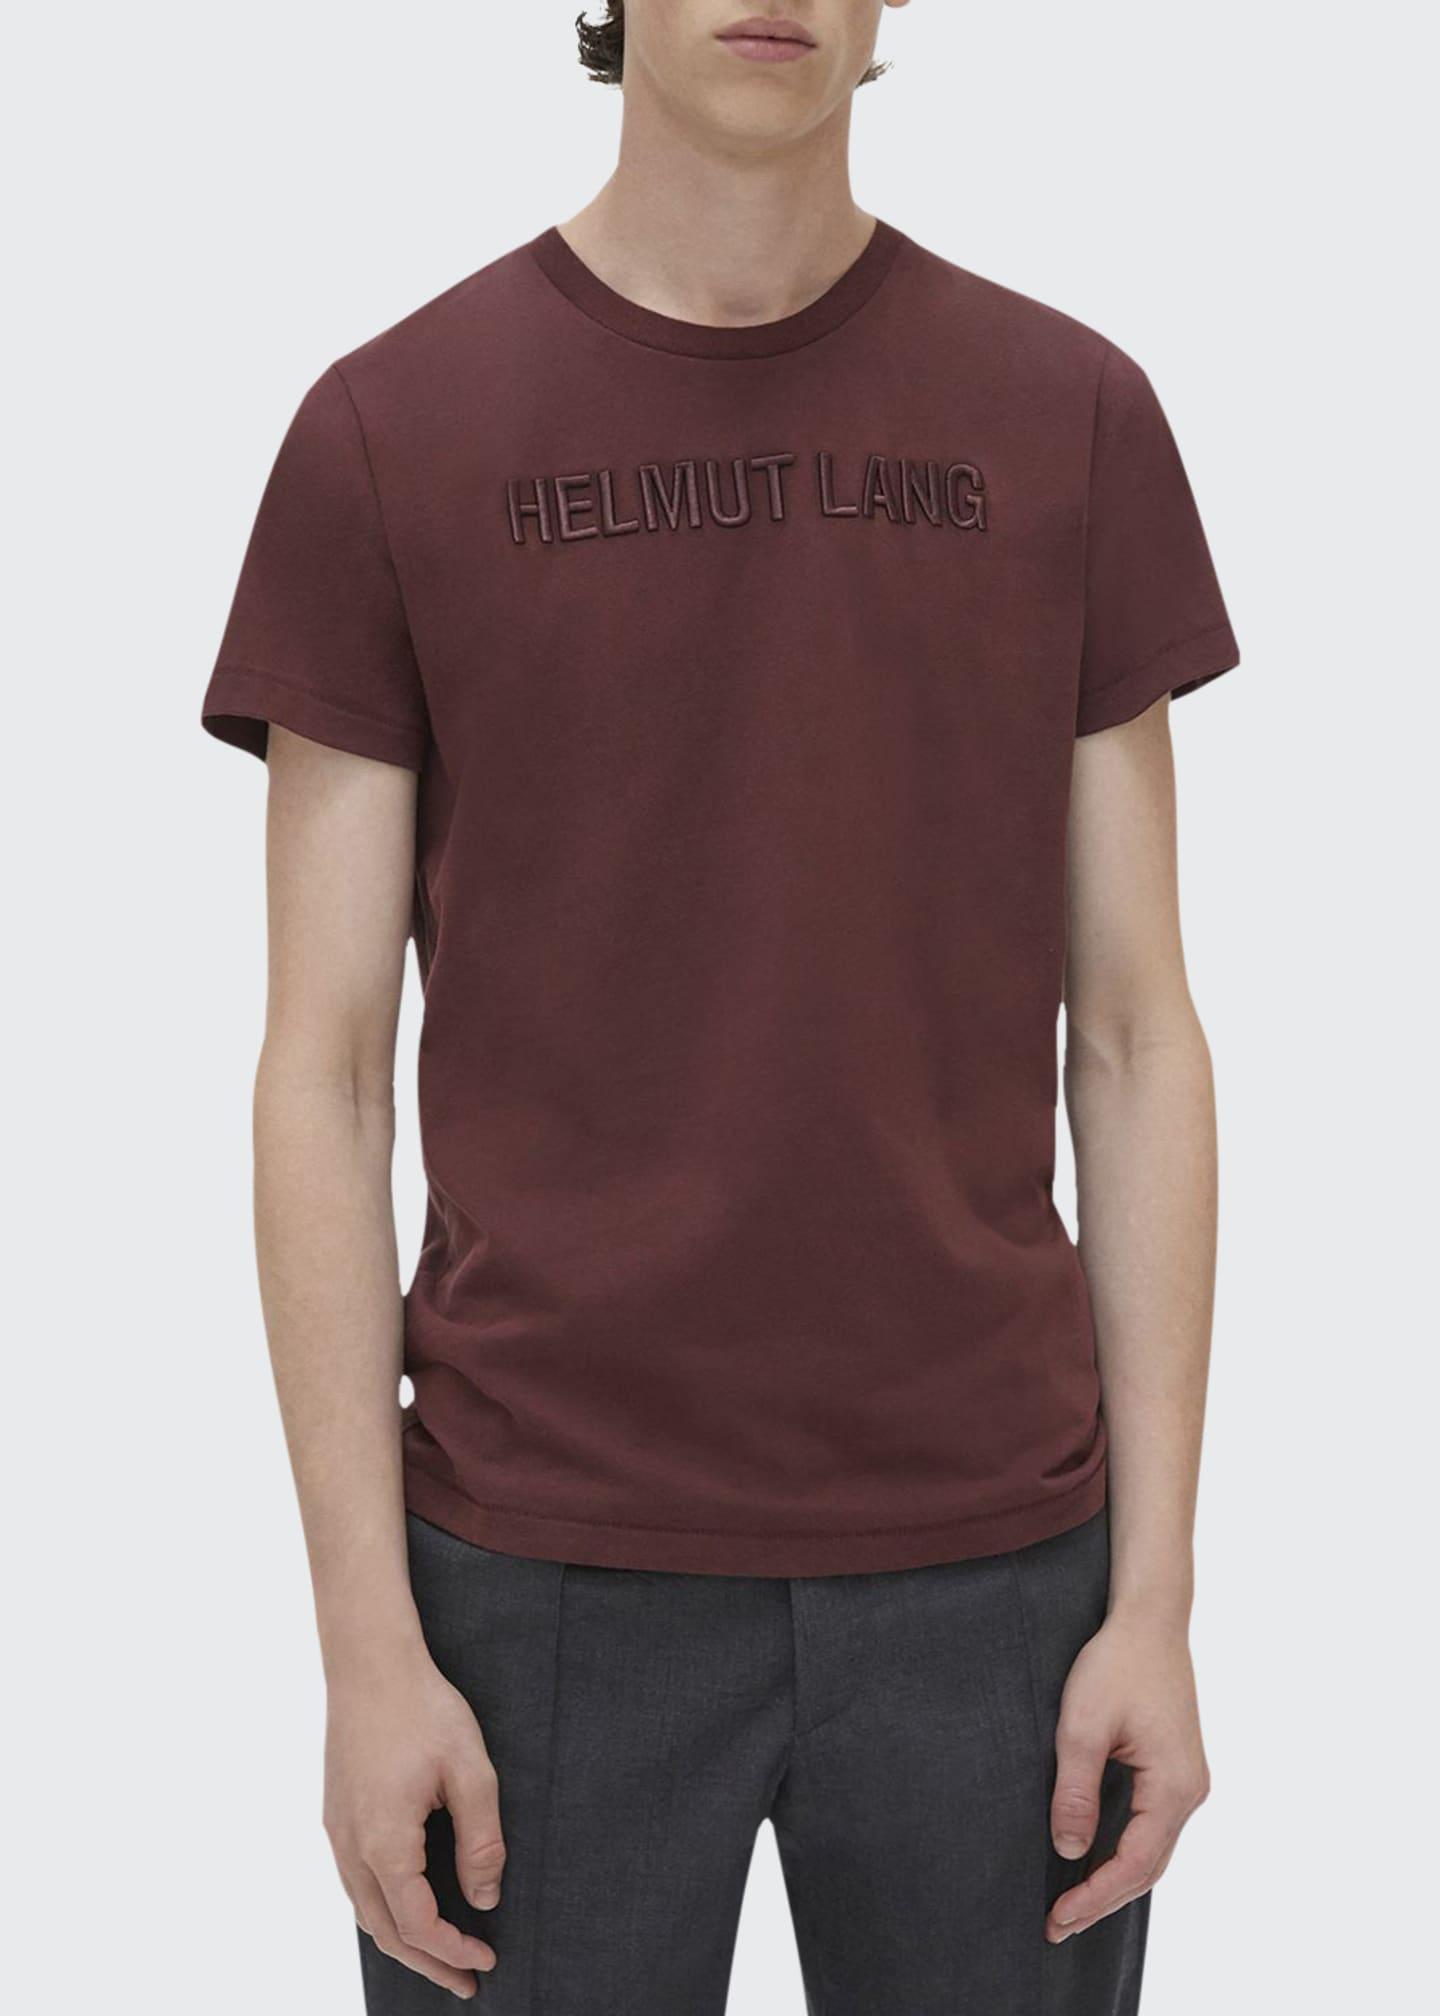 Helmut Lang Men's Raised Embroidery T-Shirt